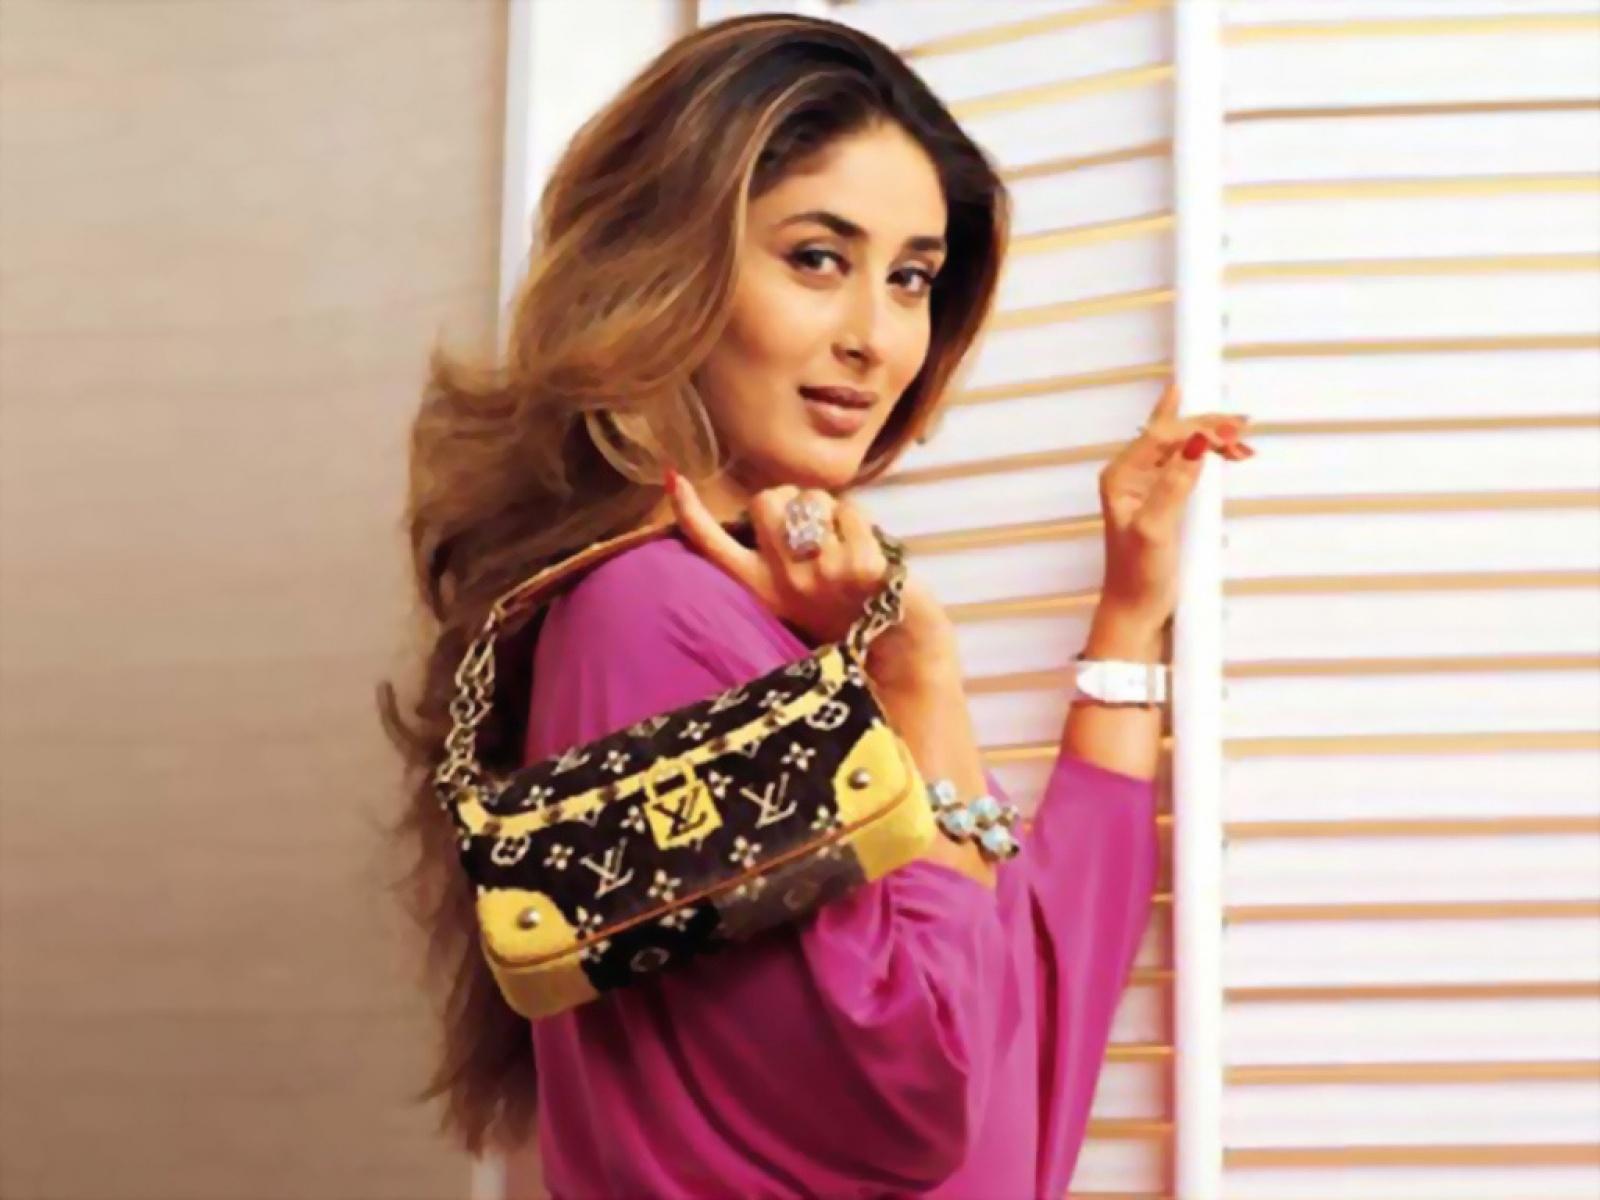 http://1.bp.blogspot.com/-edZaKkenspU/UJFqHBsxt3I/AAAAAAAAKxg/JPnhH9Rfsds/s1600/Bollywood+Kareena+Kapoor+Wallpaper+7.jpg